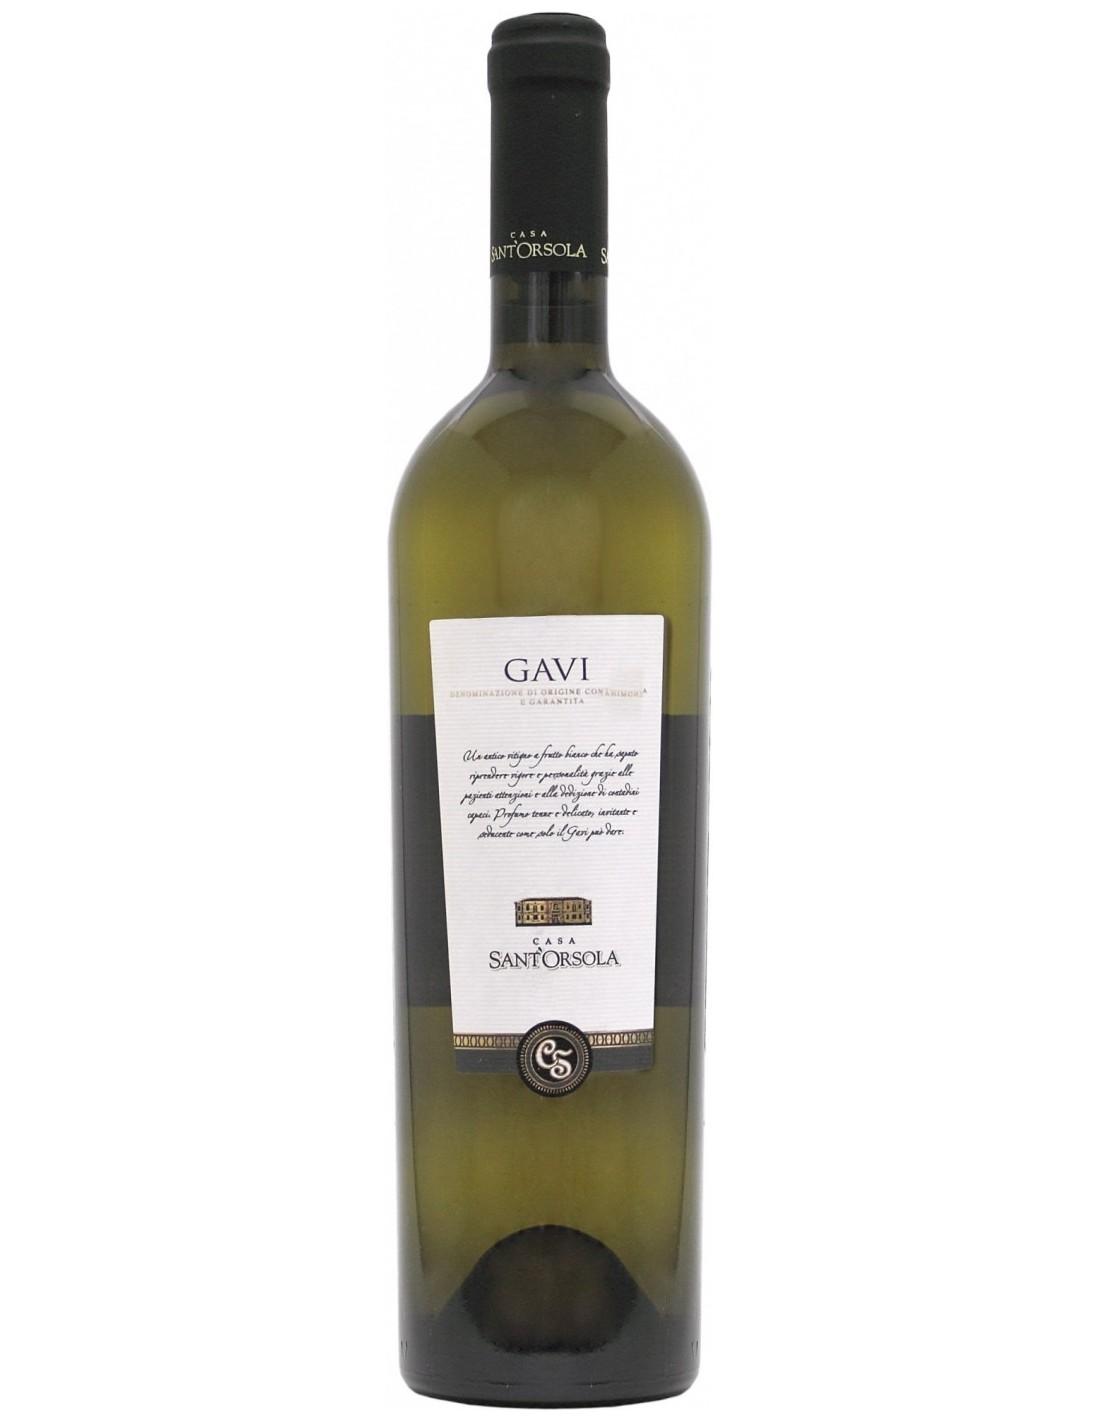 Vin alb, Cortese, Casa Sant'Orsola Gavi., 0.75L, 12% alc., Italia